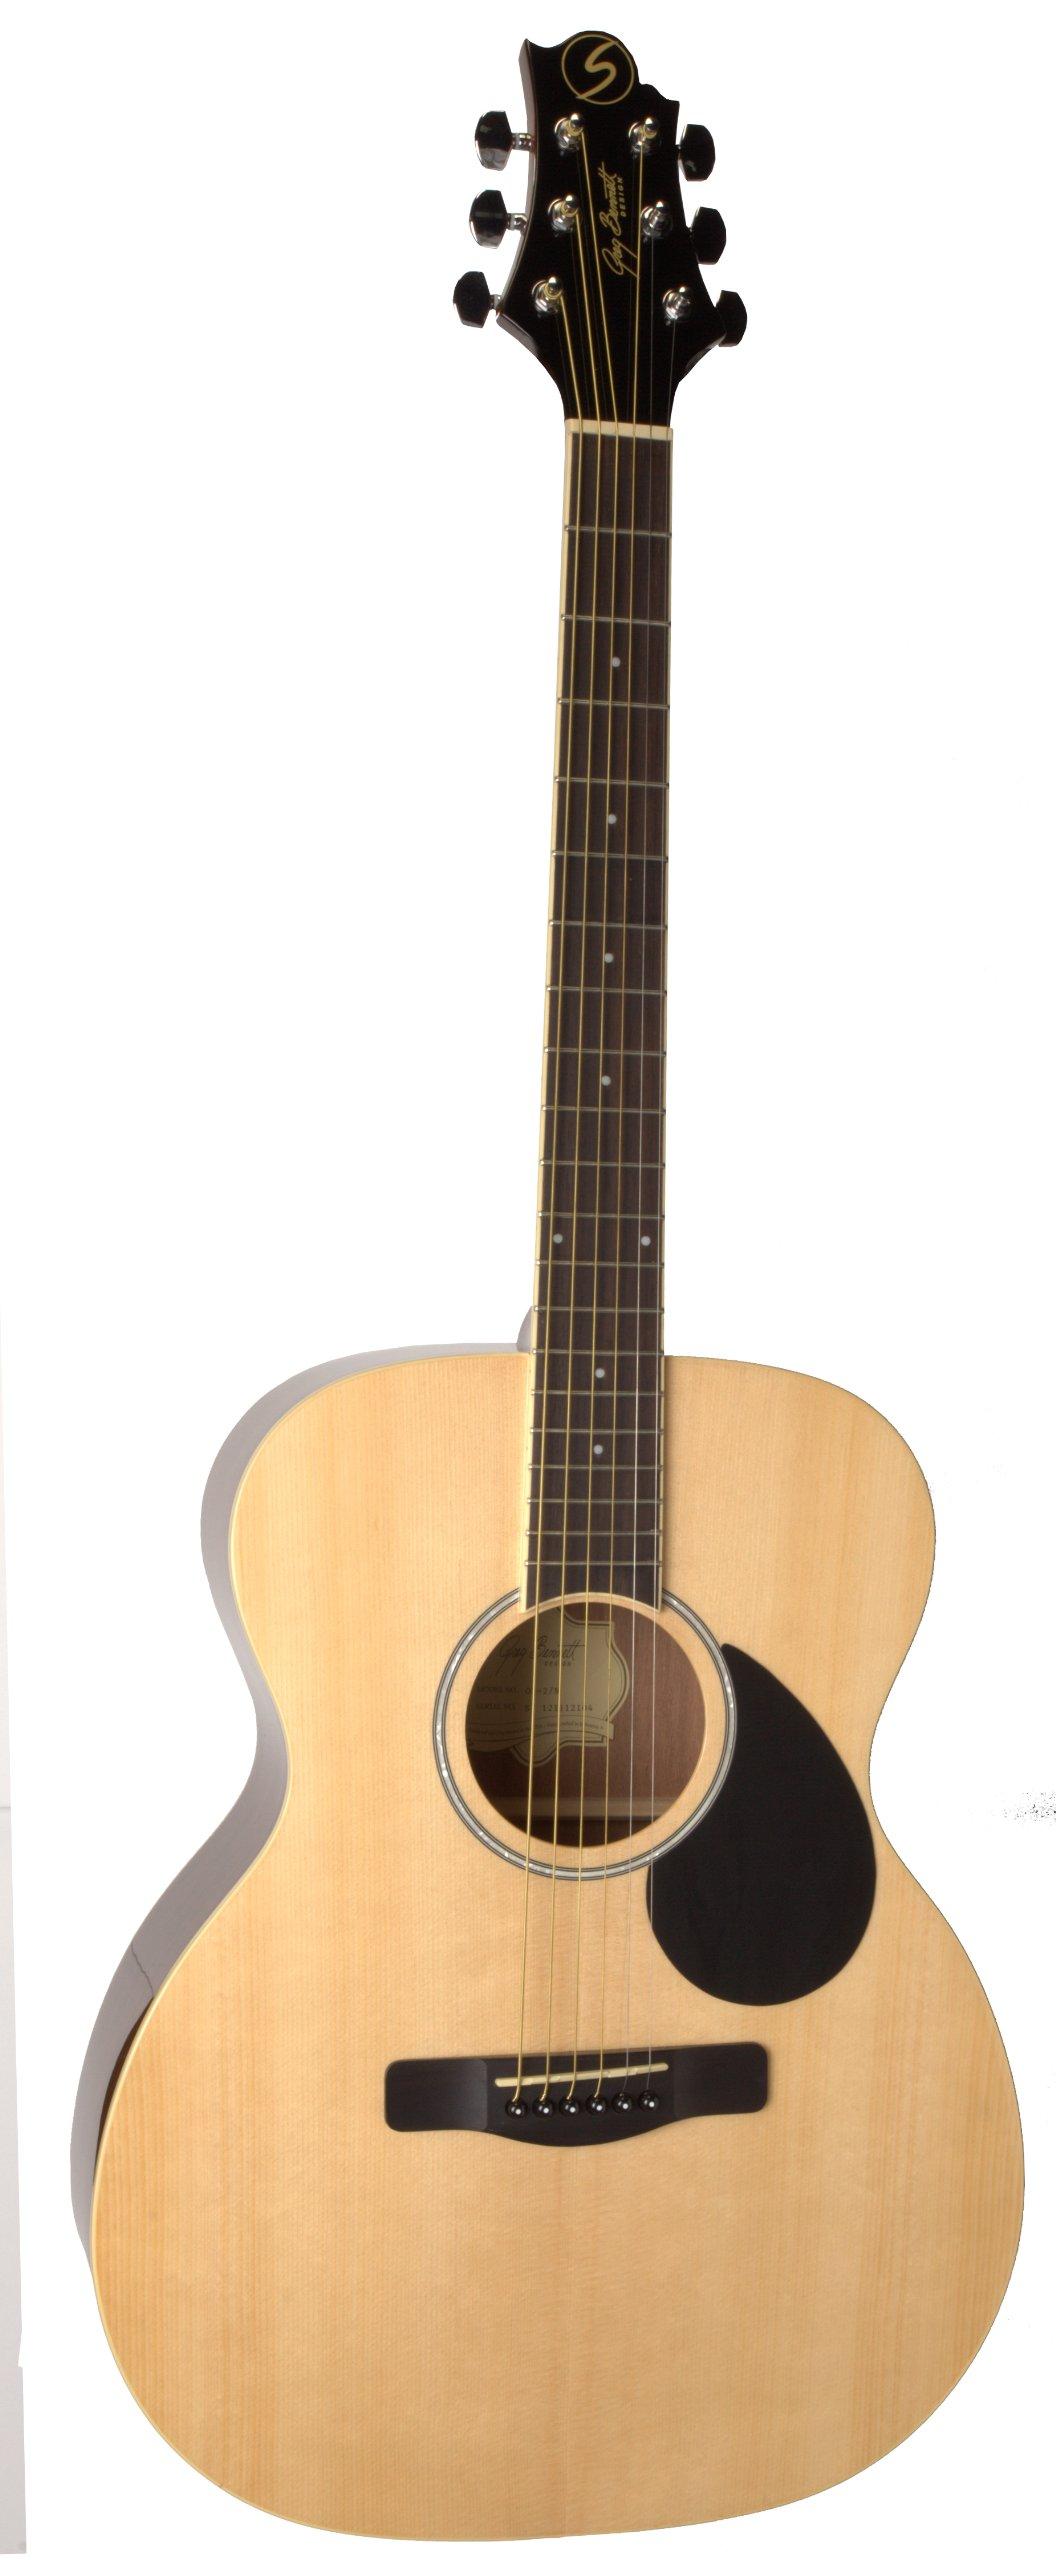 Samick Music Regency OM2 Orchestra Body Acoustic Guitar, Natural